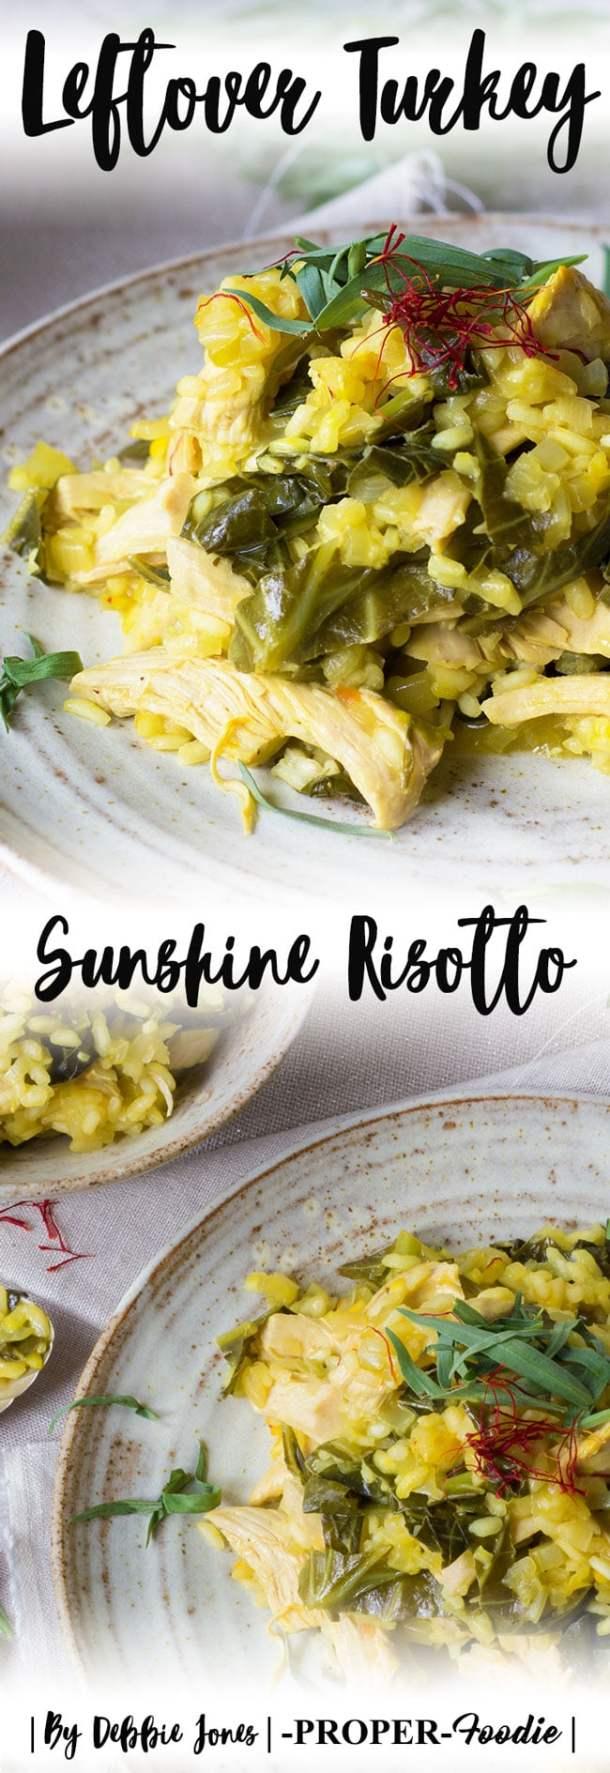 Leftover Turkey Sunshine Risotto